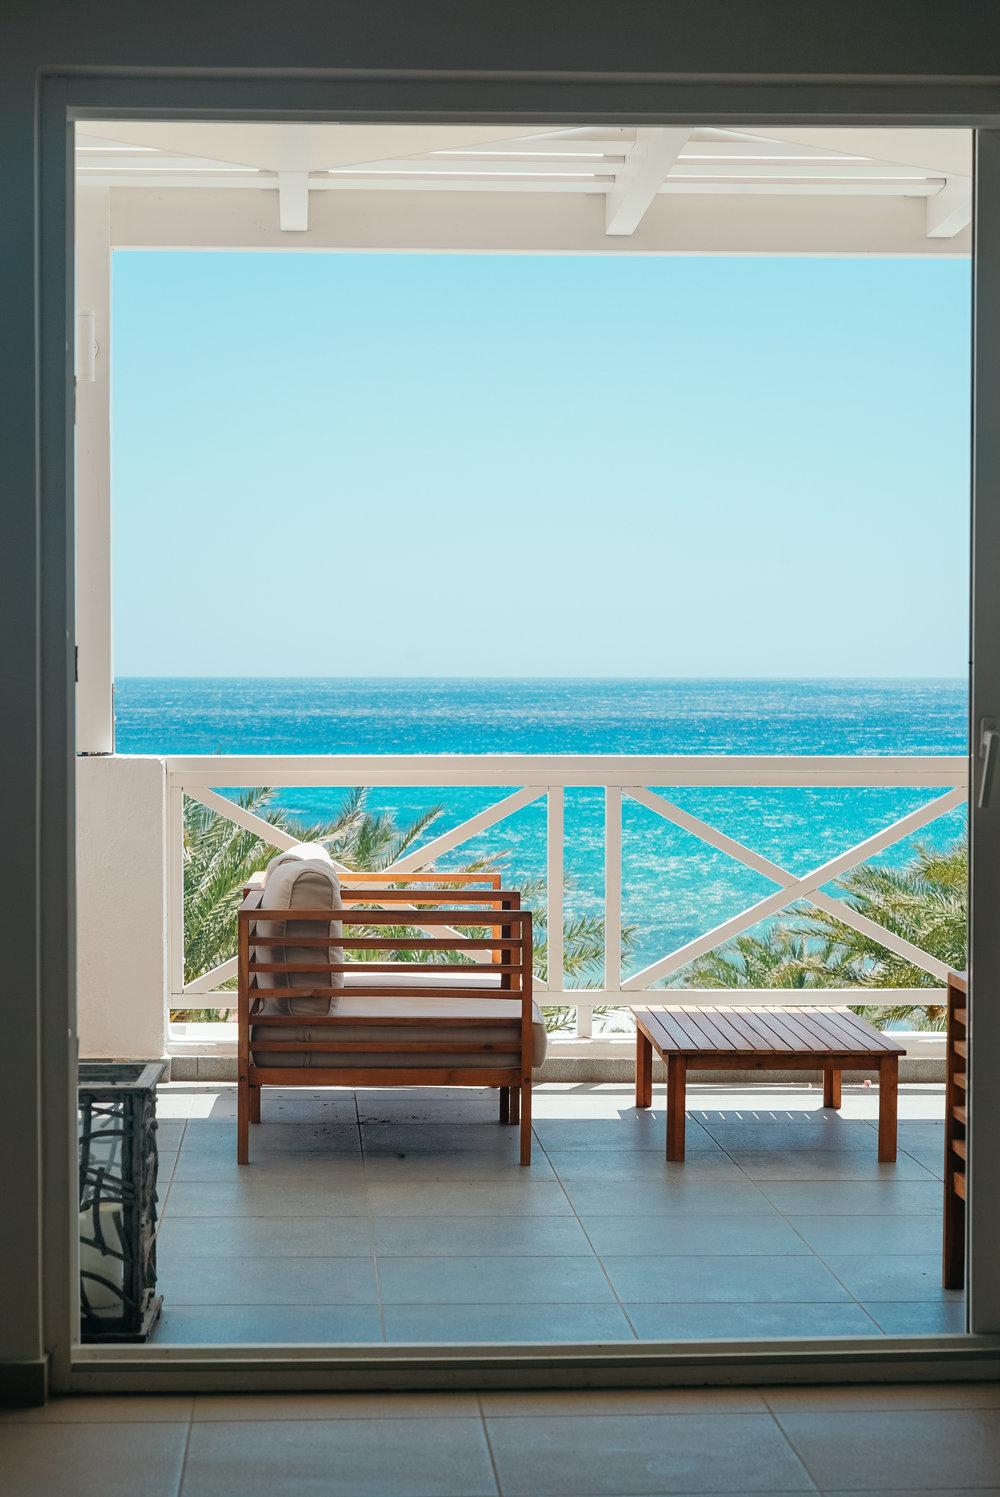 Golden Milos Bay - Reception/Lounge Area